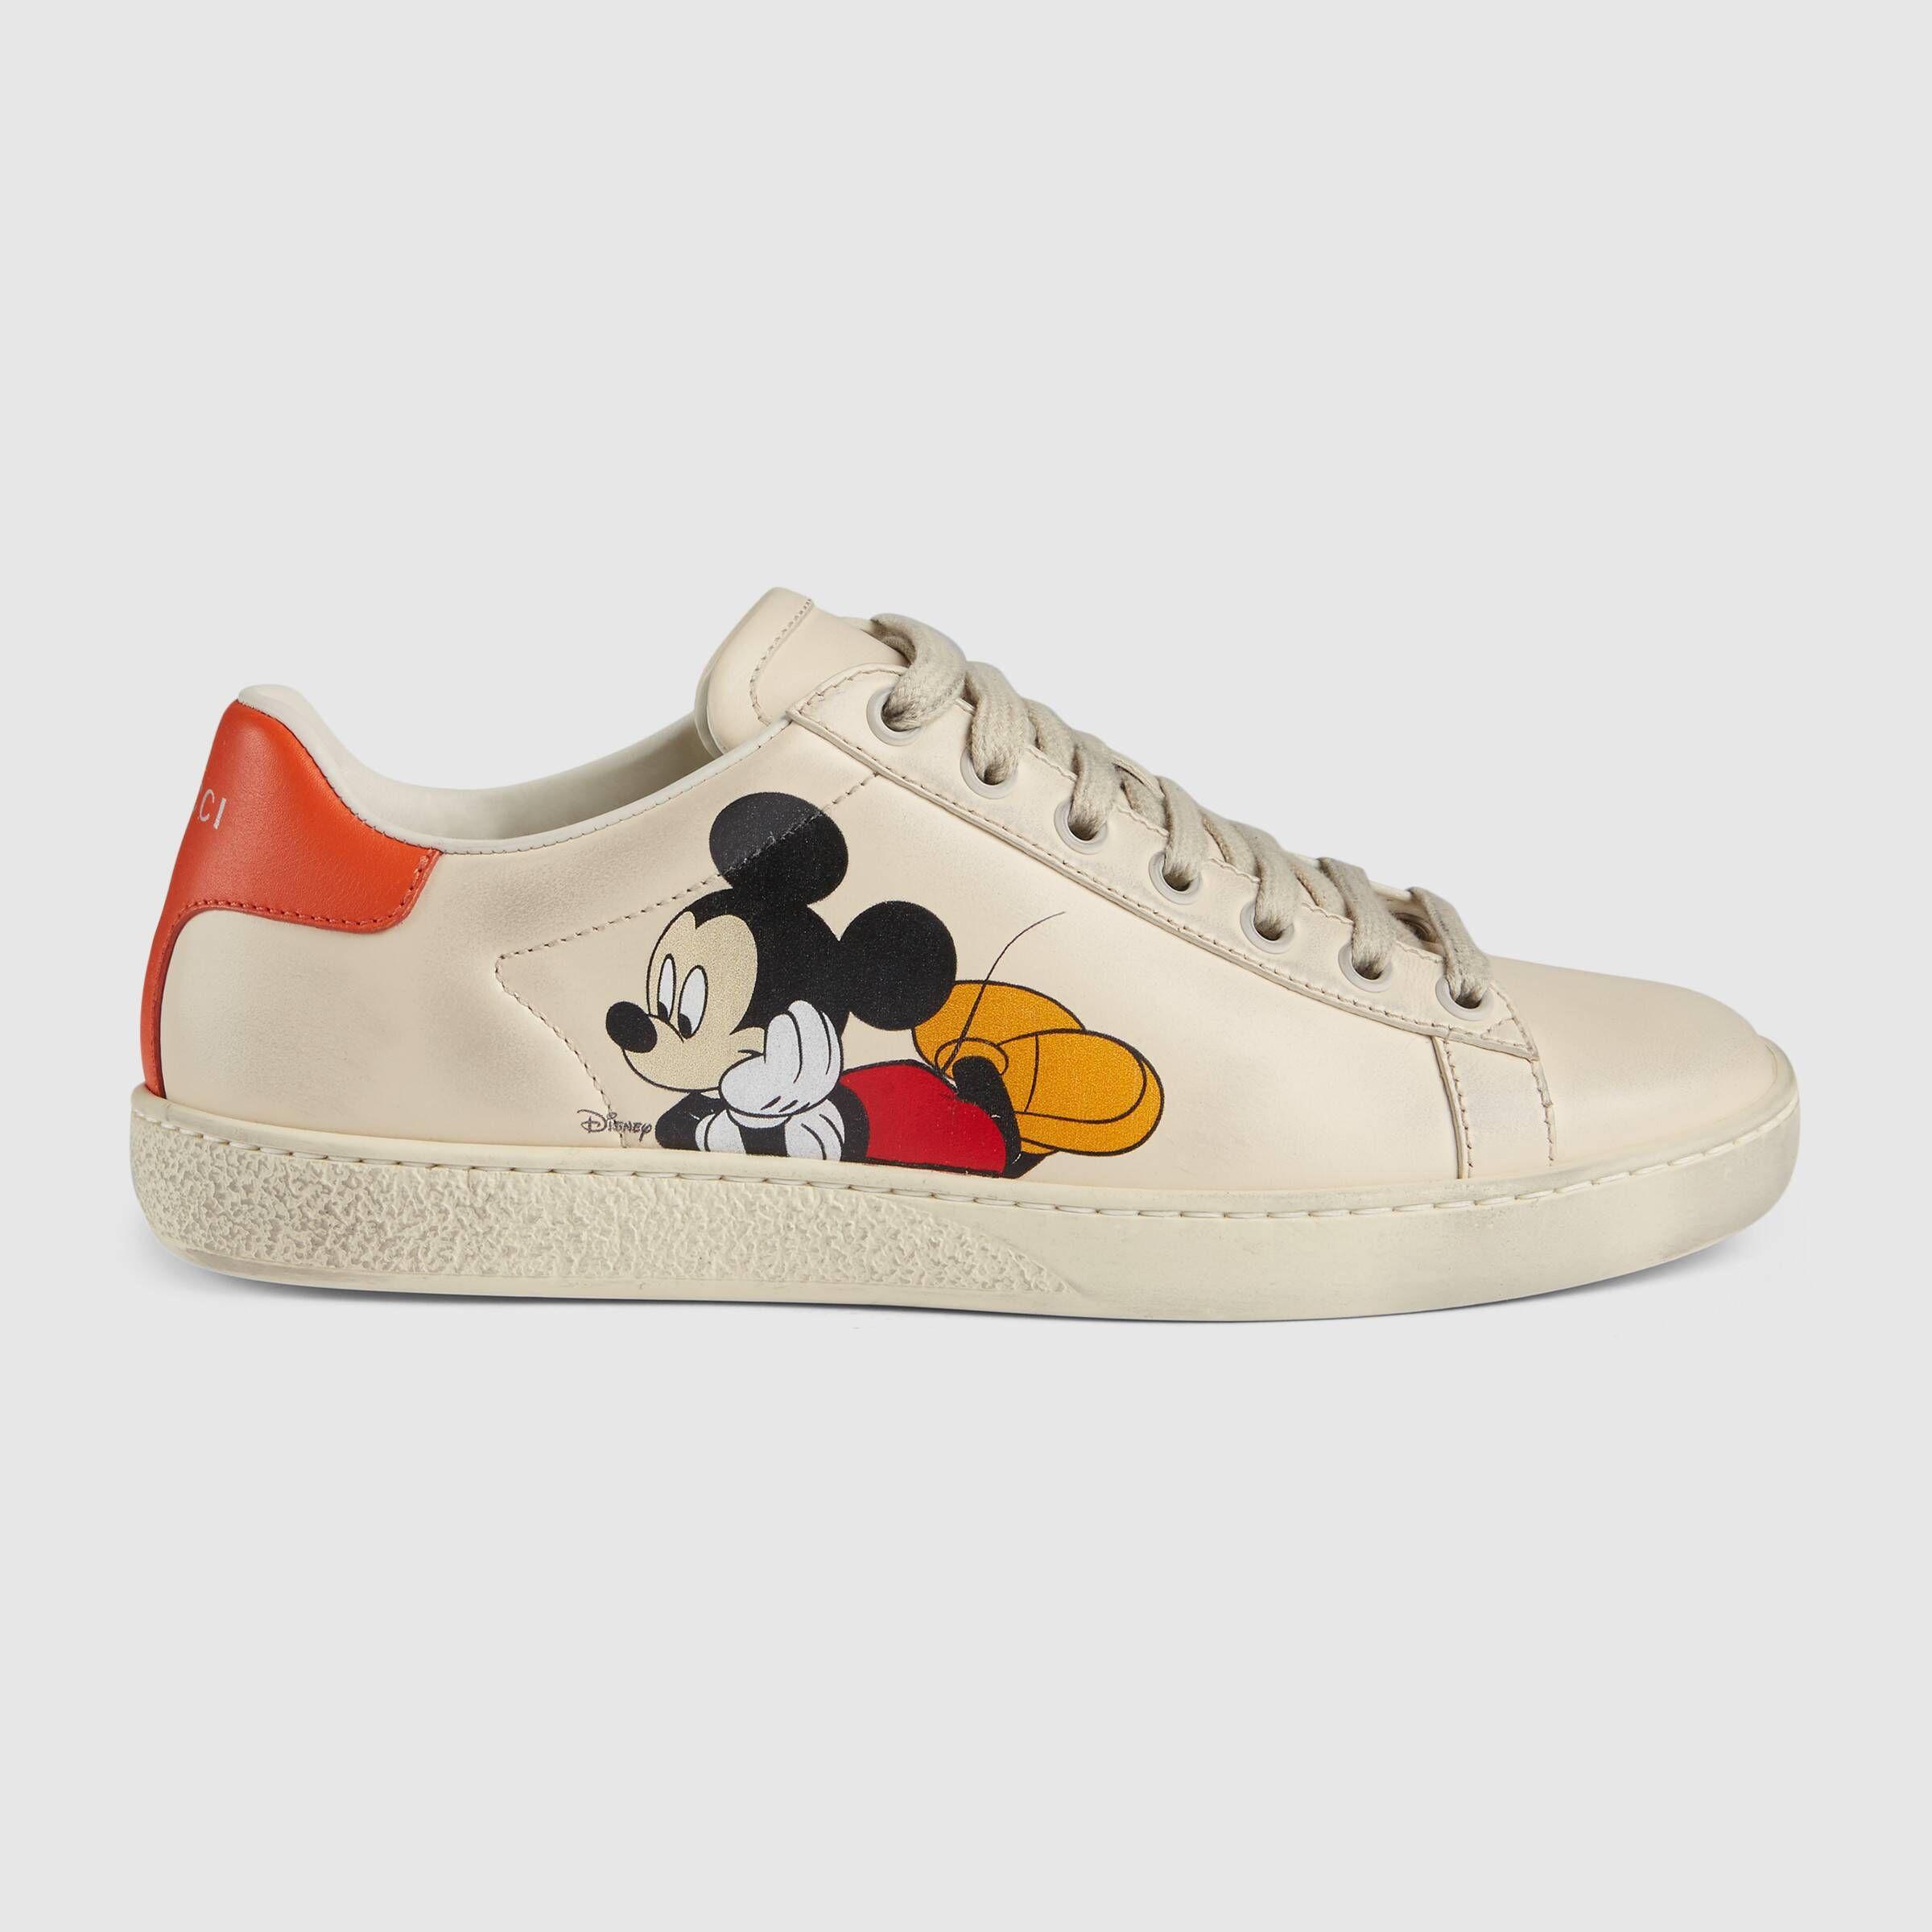 Gucci Women's Disney x Gucci Ace sneaker in 2020 Gucci